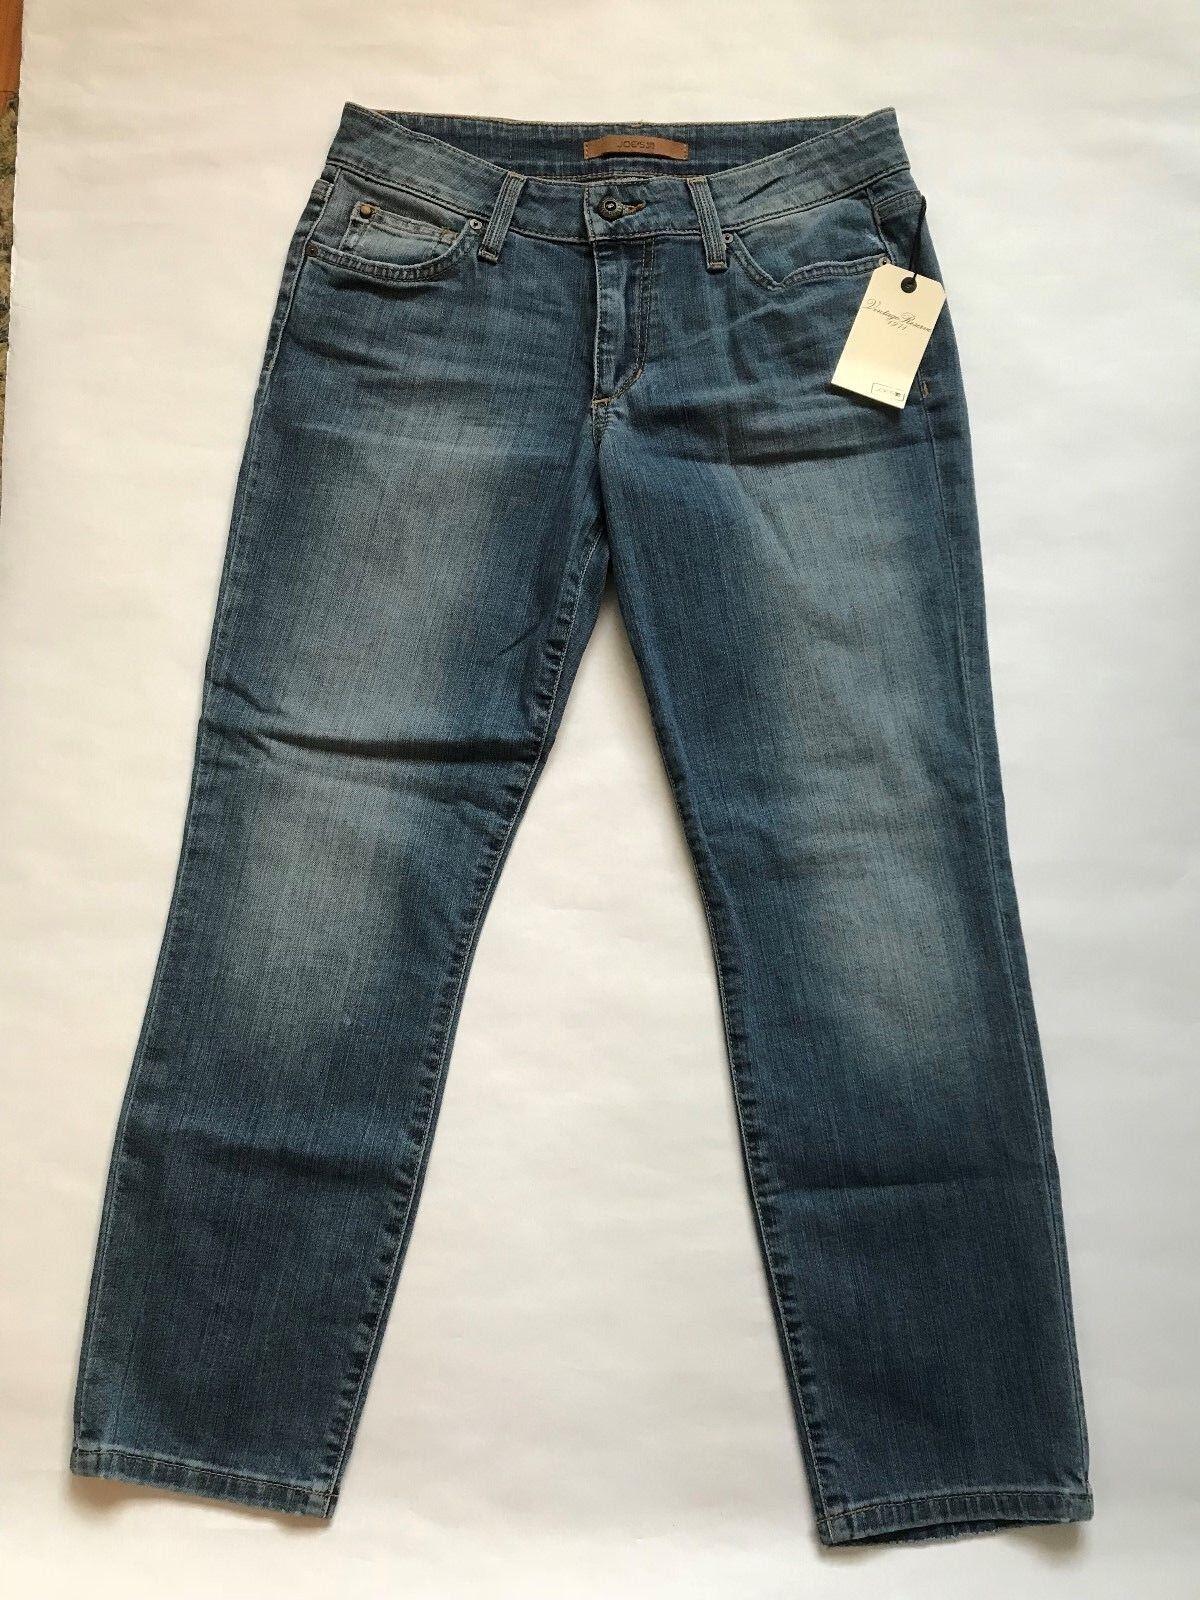 Joe's Womens Crop Jeans Size 28 Slim Straight Vintage Reserve Lottie NWT